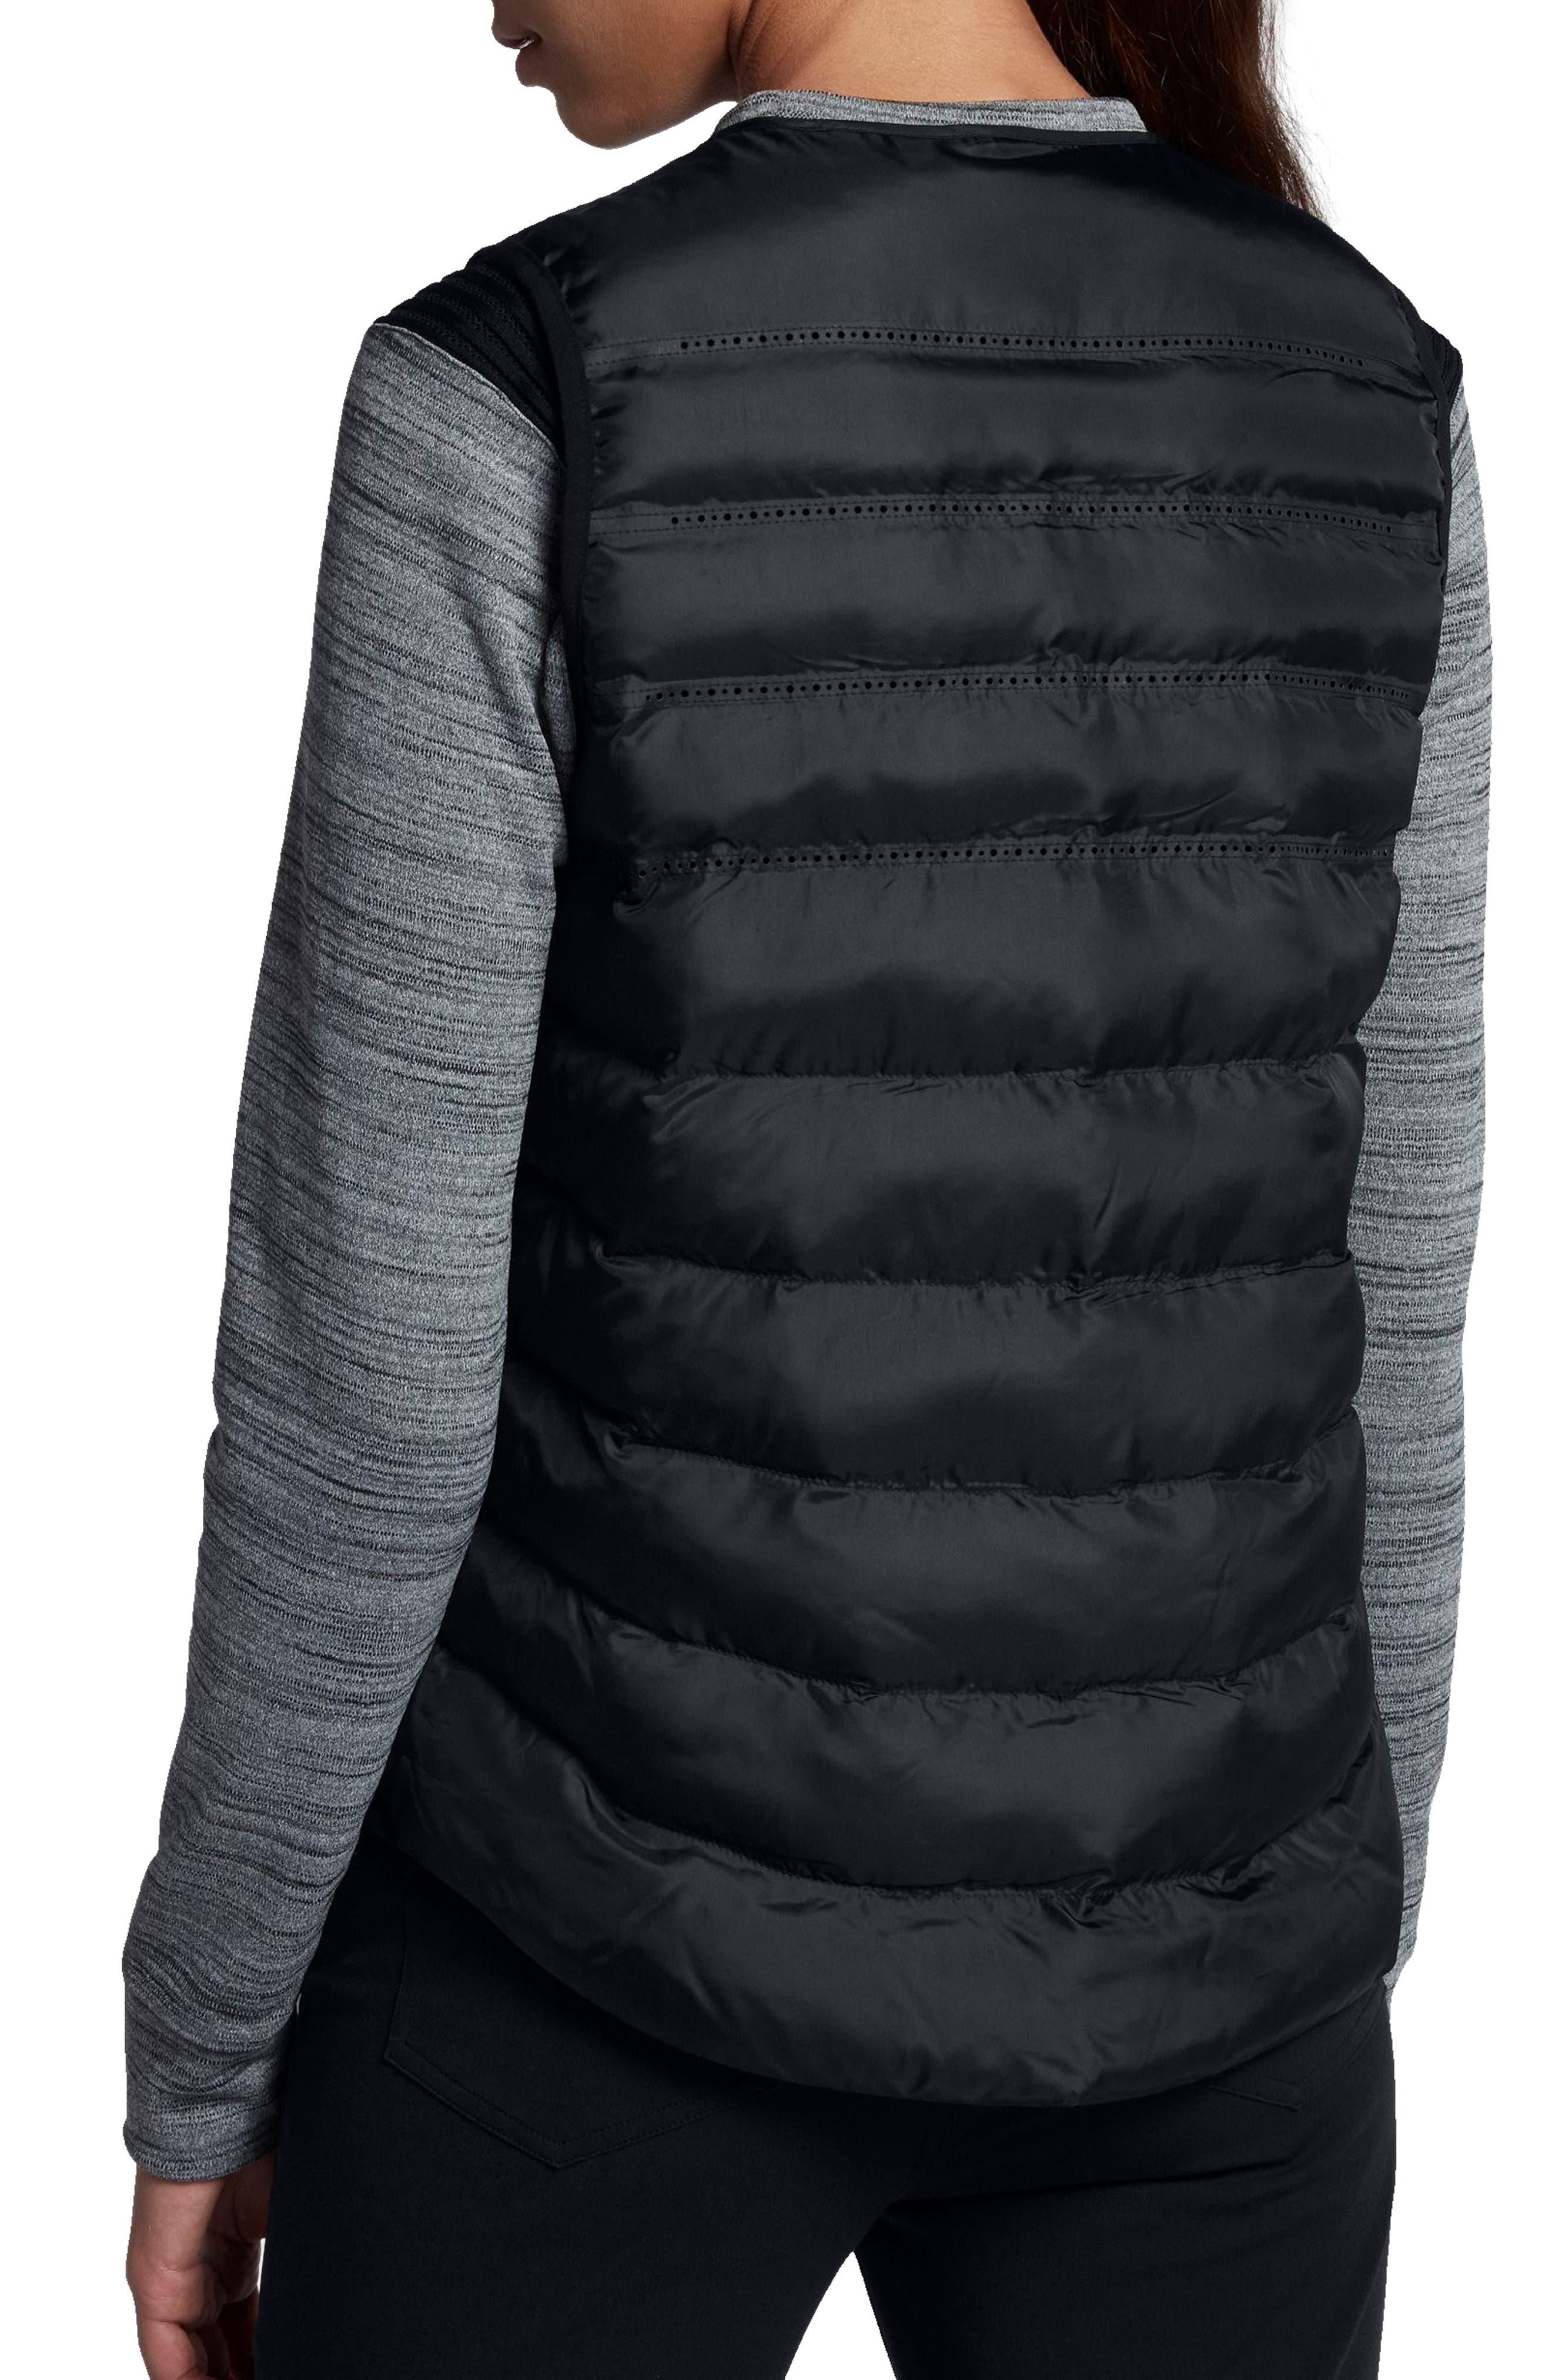 AeroLoft Water Repellent Running Vest,                             Alternate thumbnail 2, color,                             010